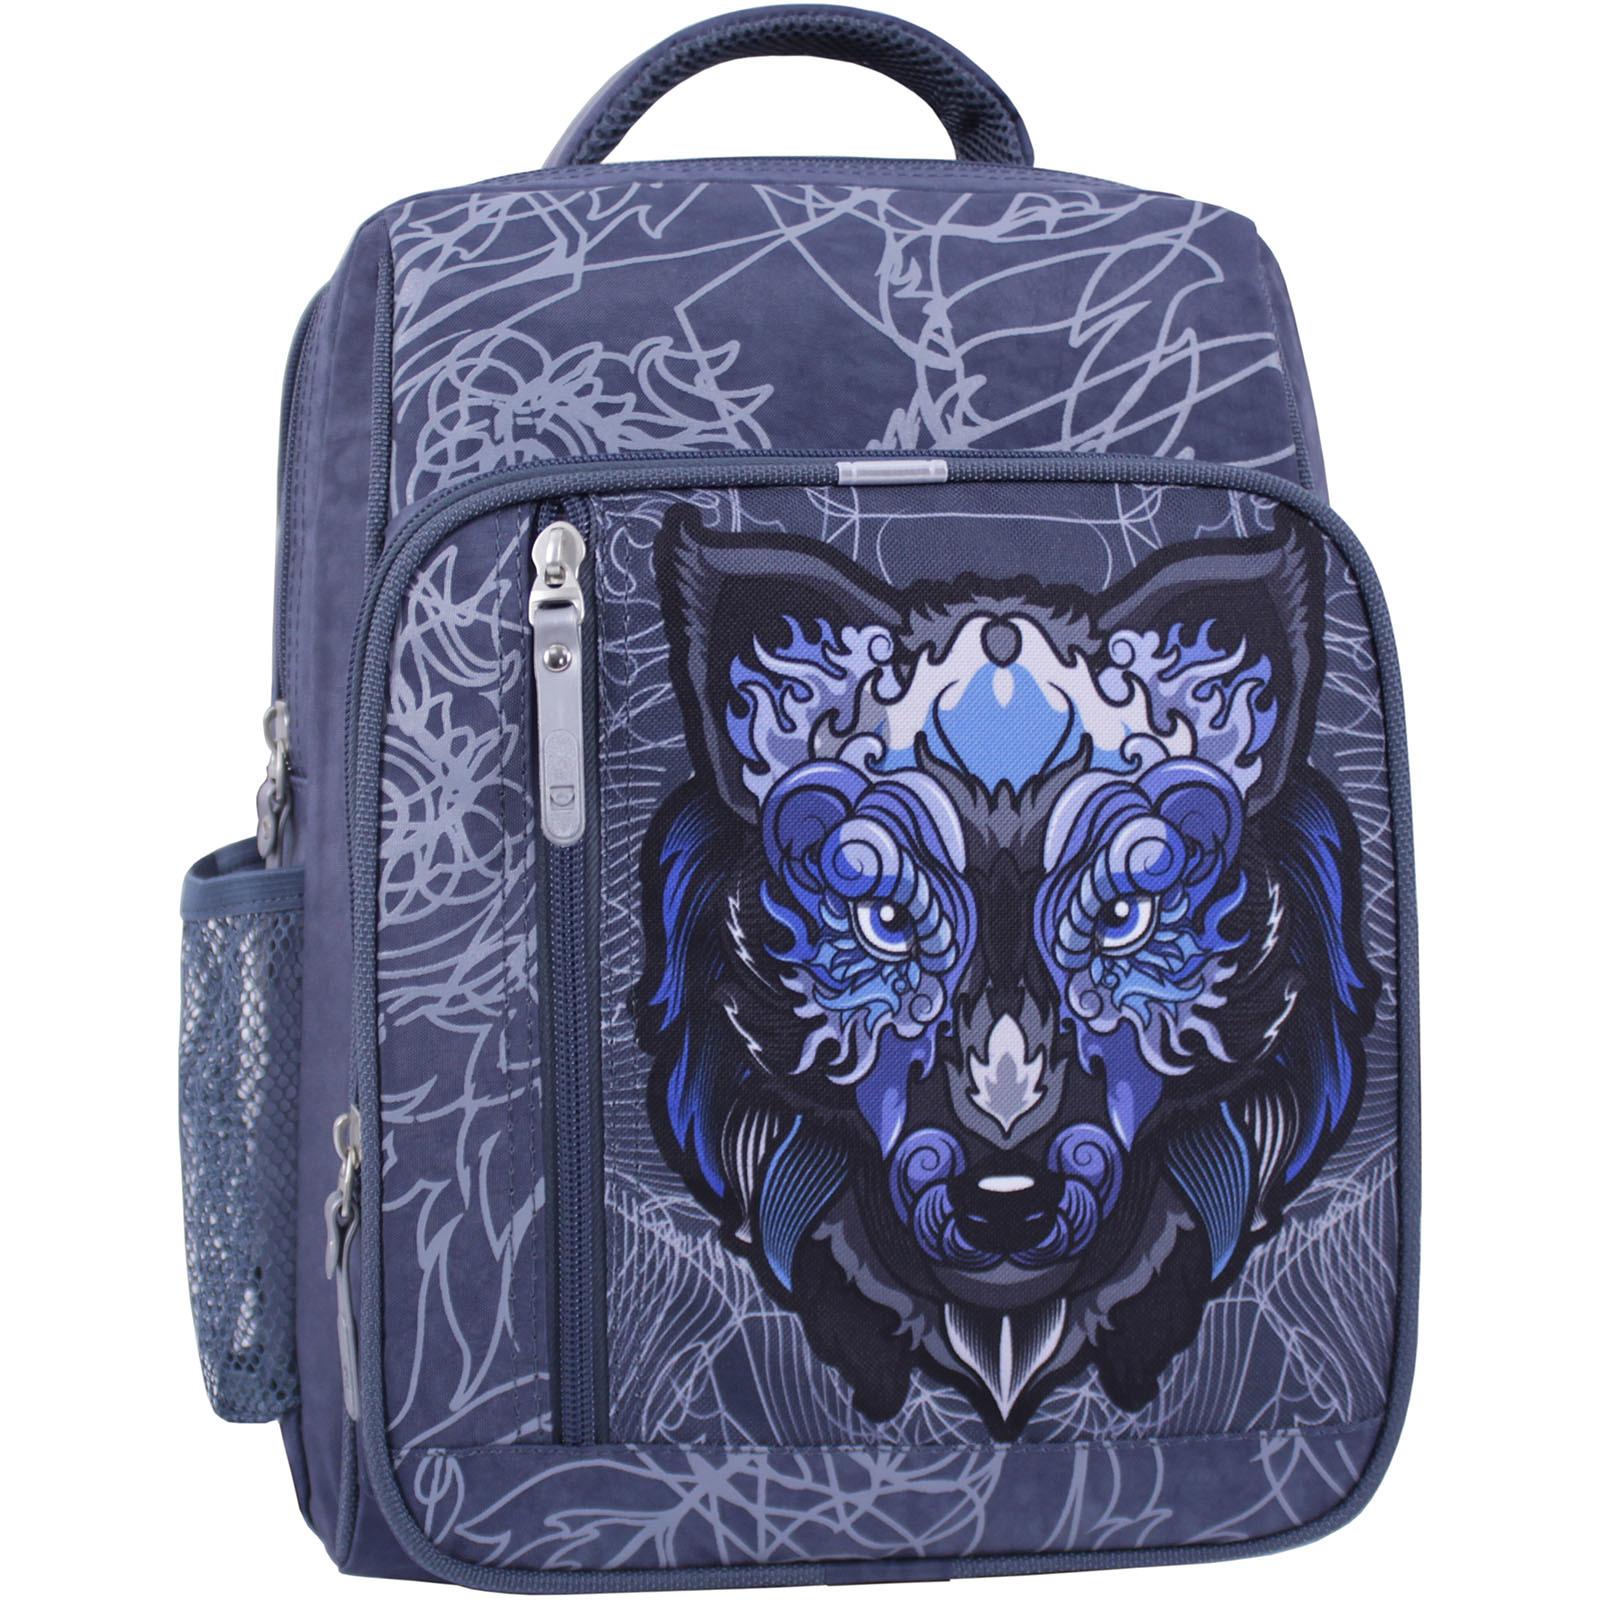 Школьные рюкзаки Рюкзак школьный Bagland Школьник 8 л. 321 серый 506 (0012870) IMG_0967_суб.506_.JPG